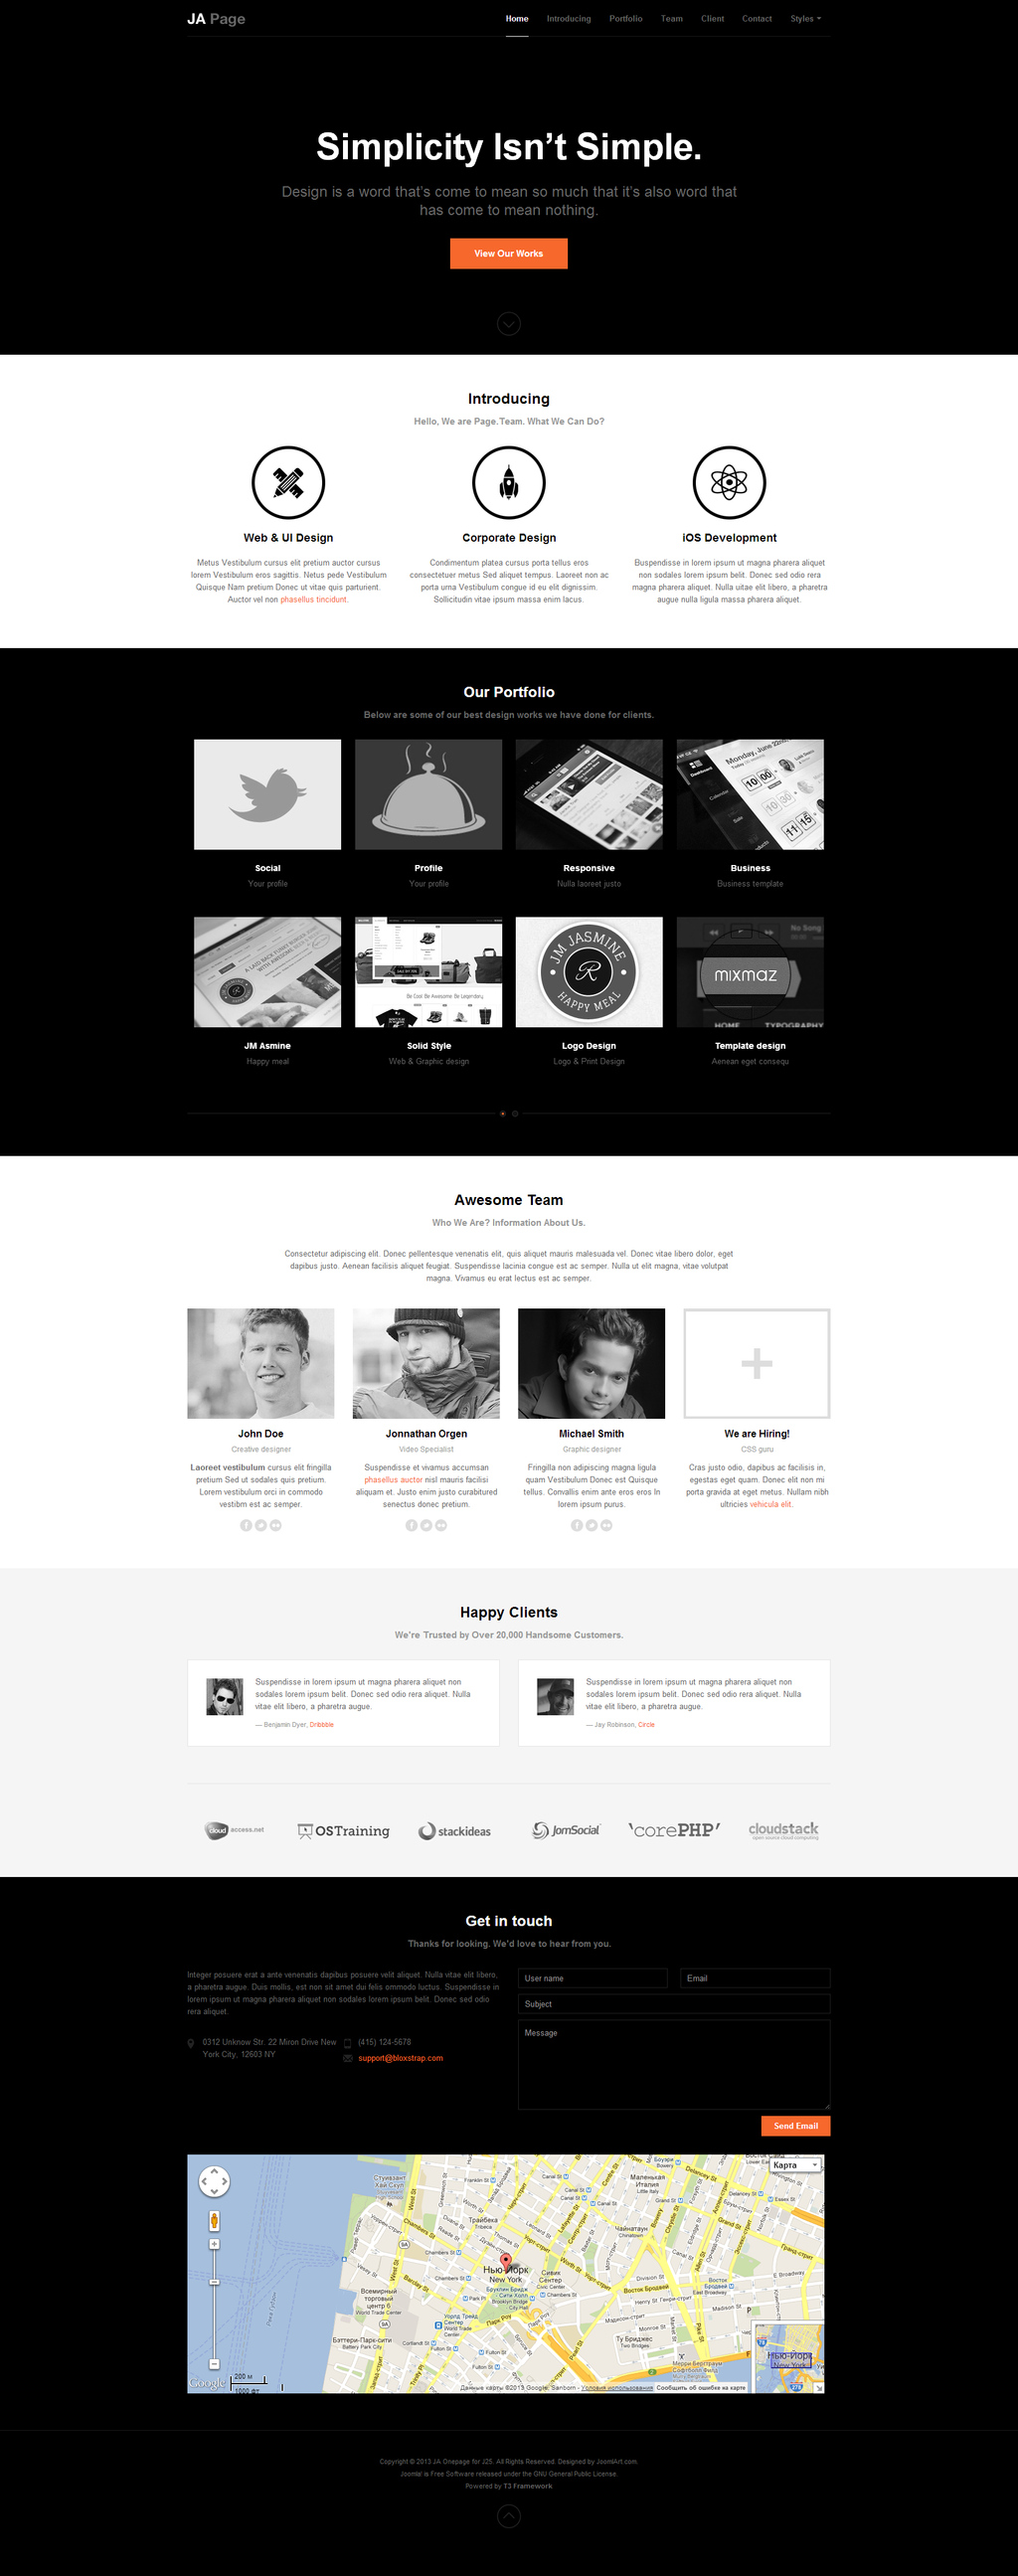 Download joomla art gallery template free software for Joomla administrator templates